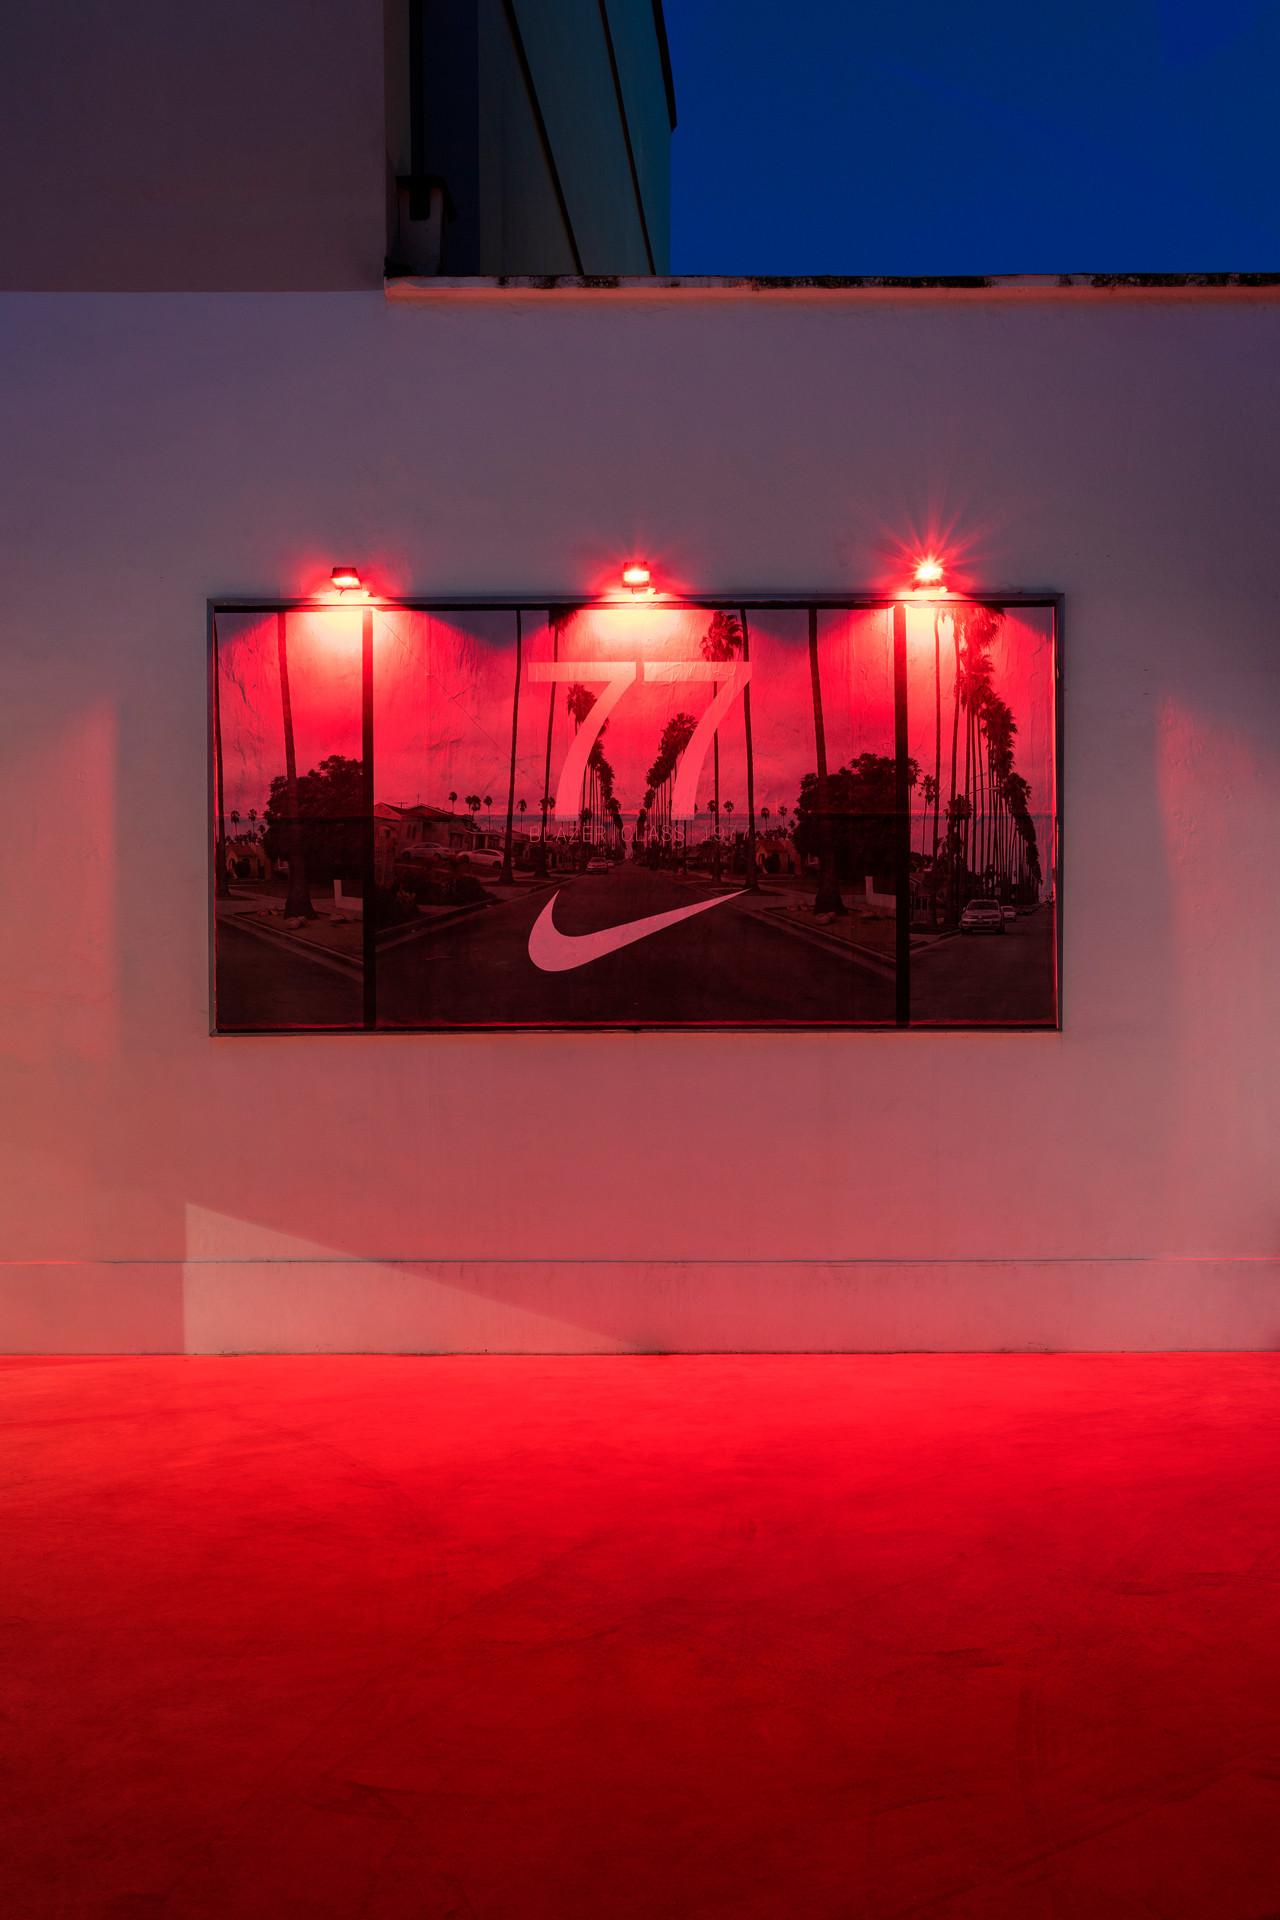 NikeBlazerClass77_DSC6208.jpg